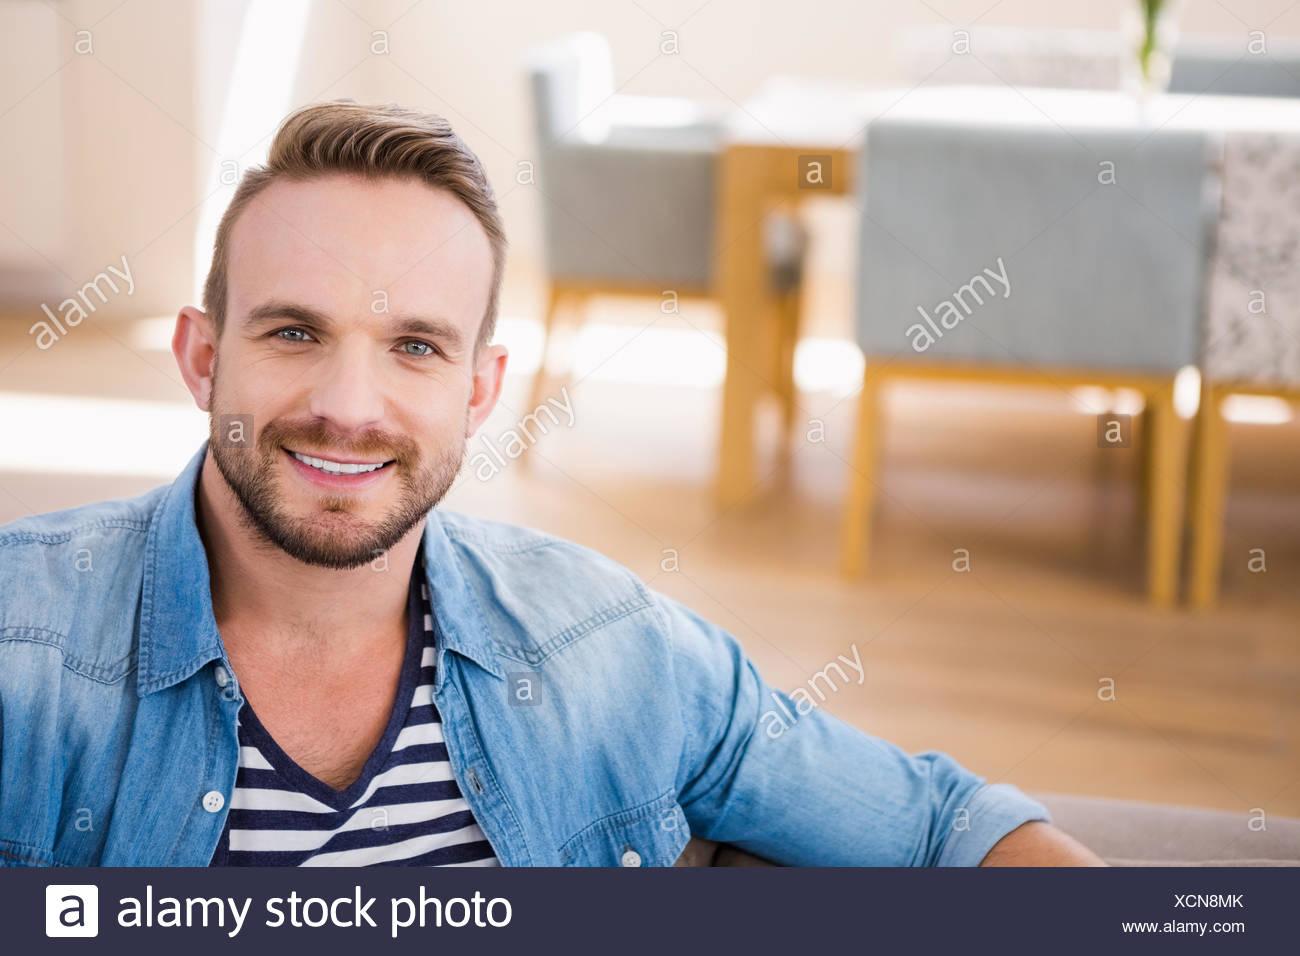 Handsome man smiling at camera - Stock Image